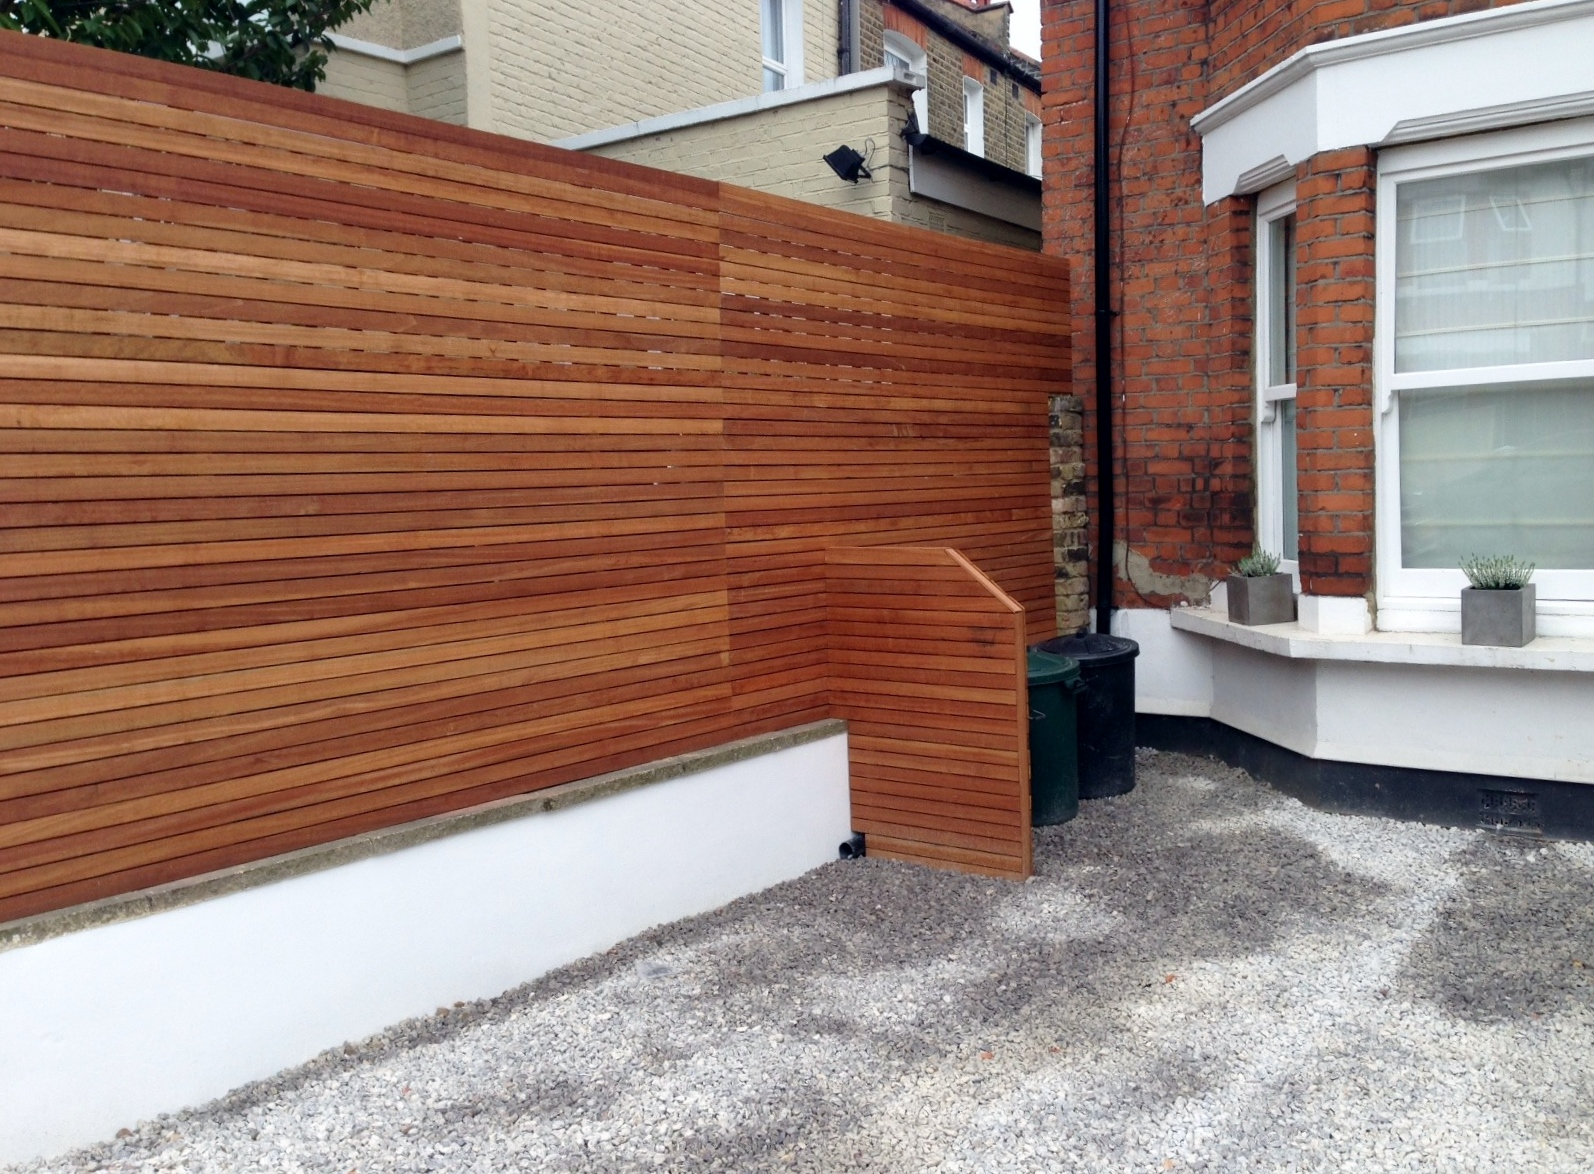 front garden drivewat gravel travertine paving path hardwood privacy screen trellis tooting london (1)